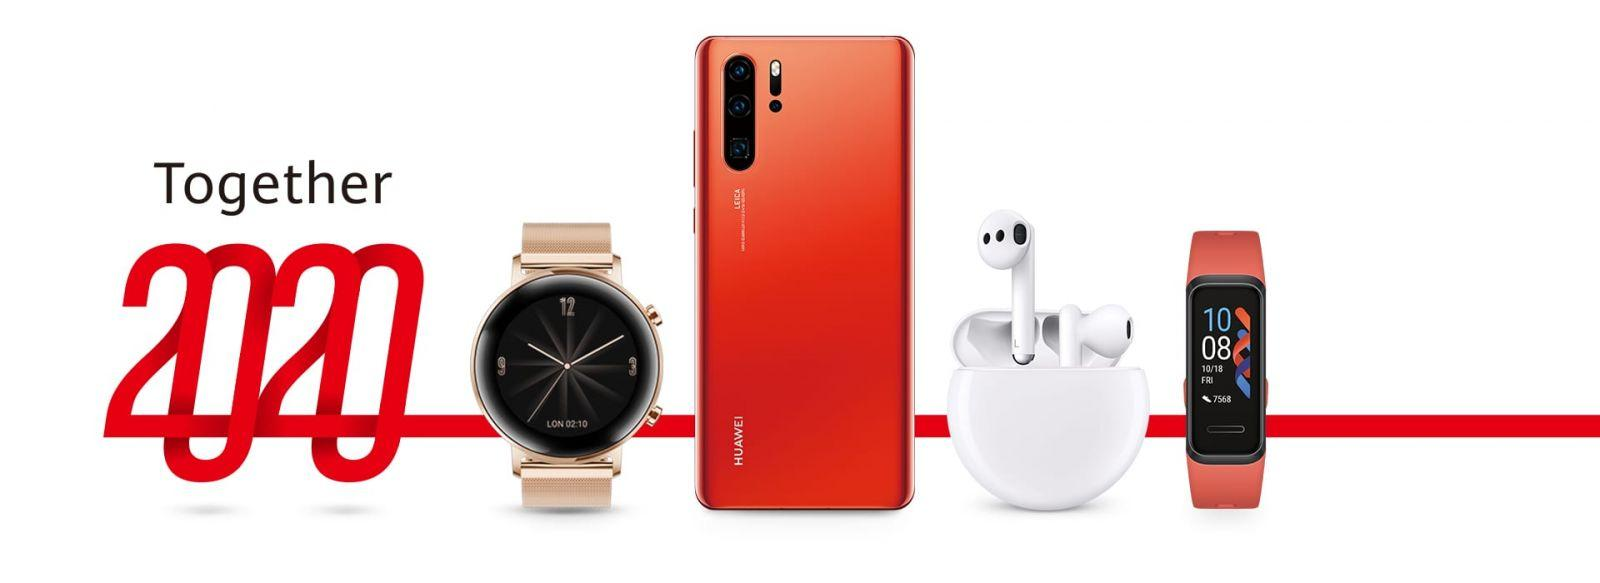 Huawei и Honor запустили новогодние акции в магазинах (christmas s1 pc 1)